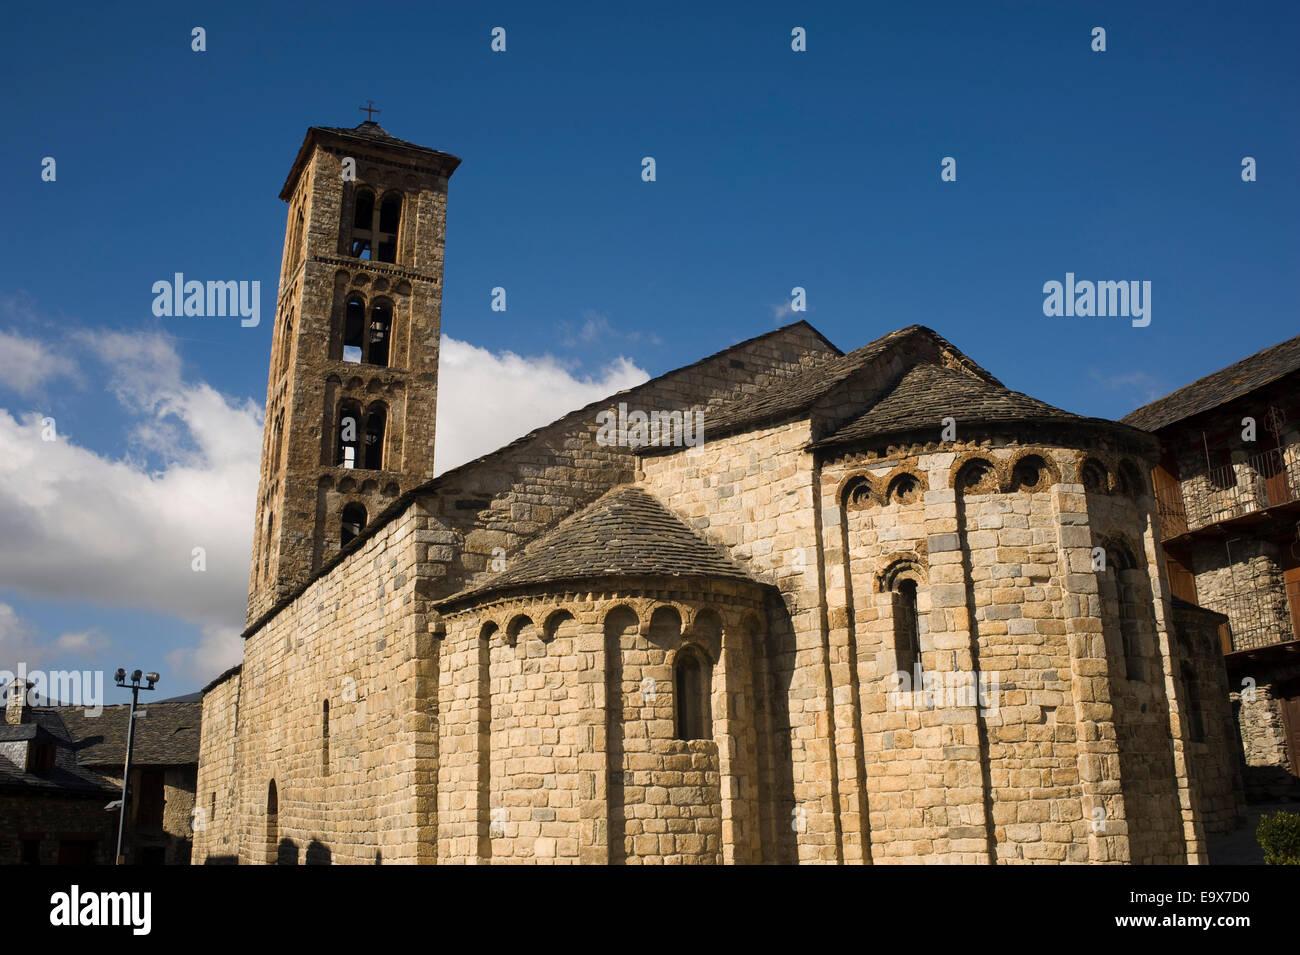 Santa Maria de Taull romanesque church. Taull, Vall de Boi, Lleida, Catalonia, Spain. Unesco World Heritage Site. - Stock Image